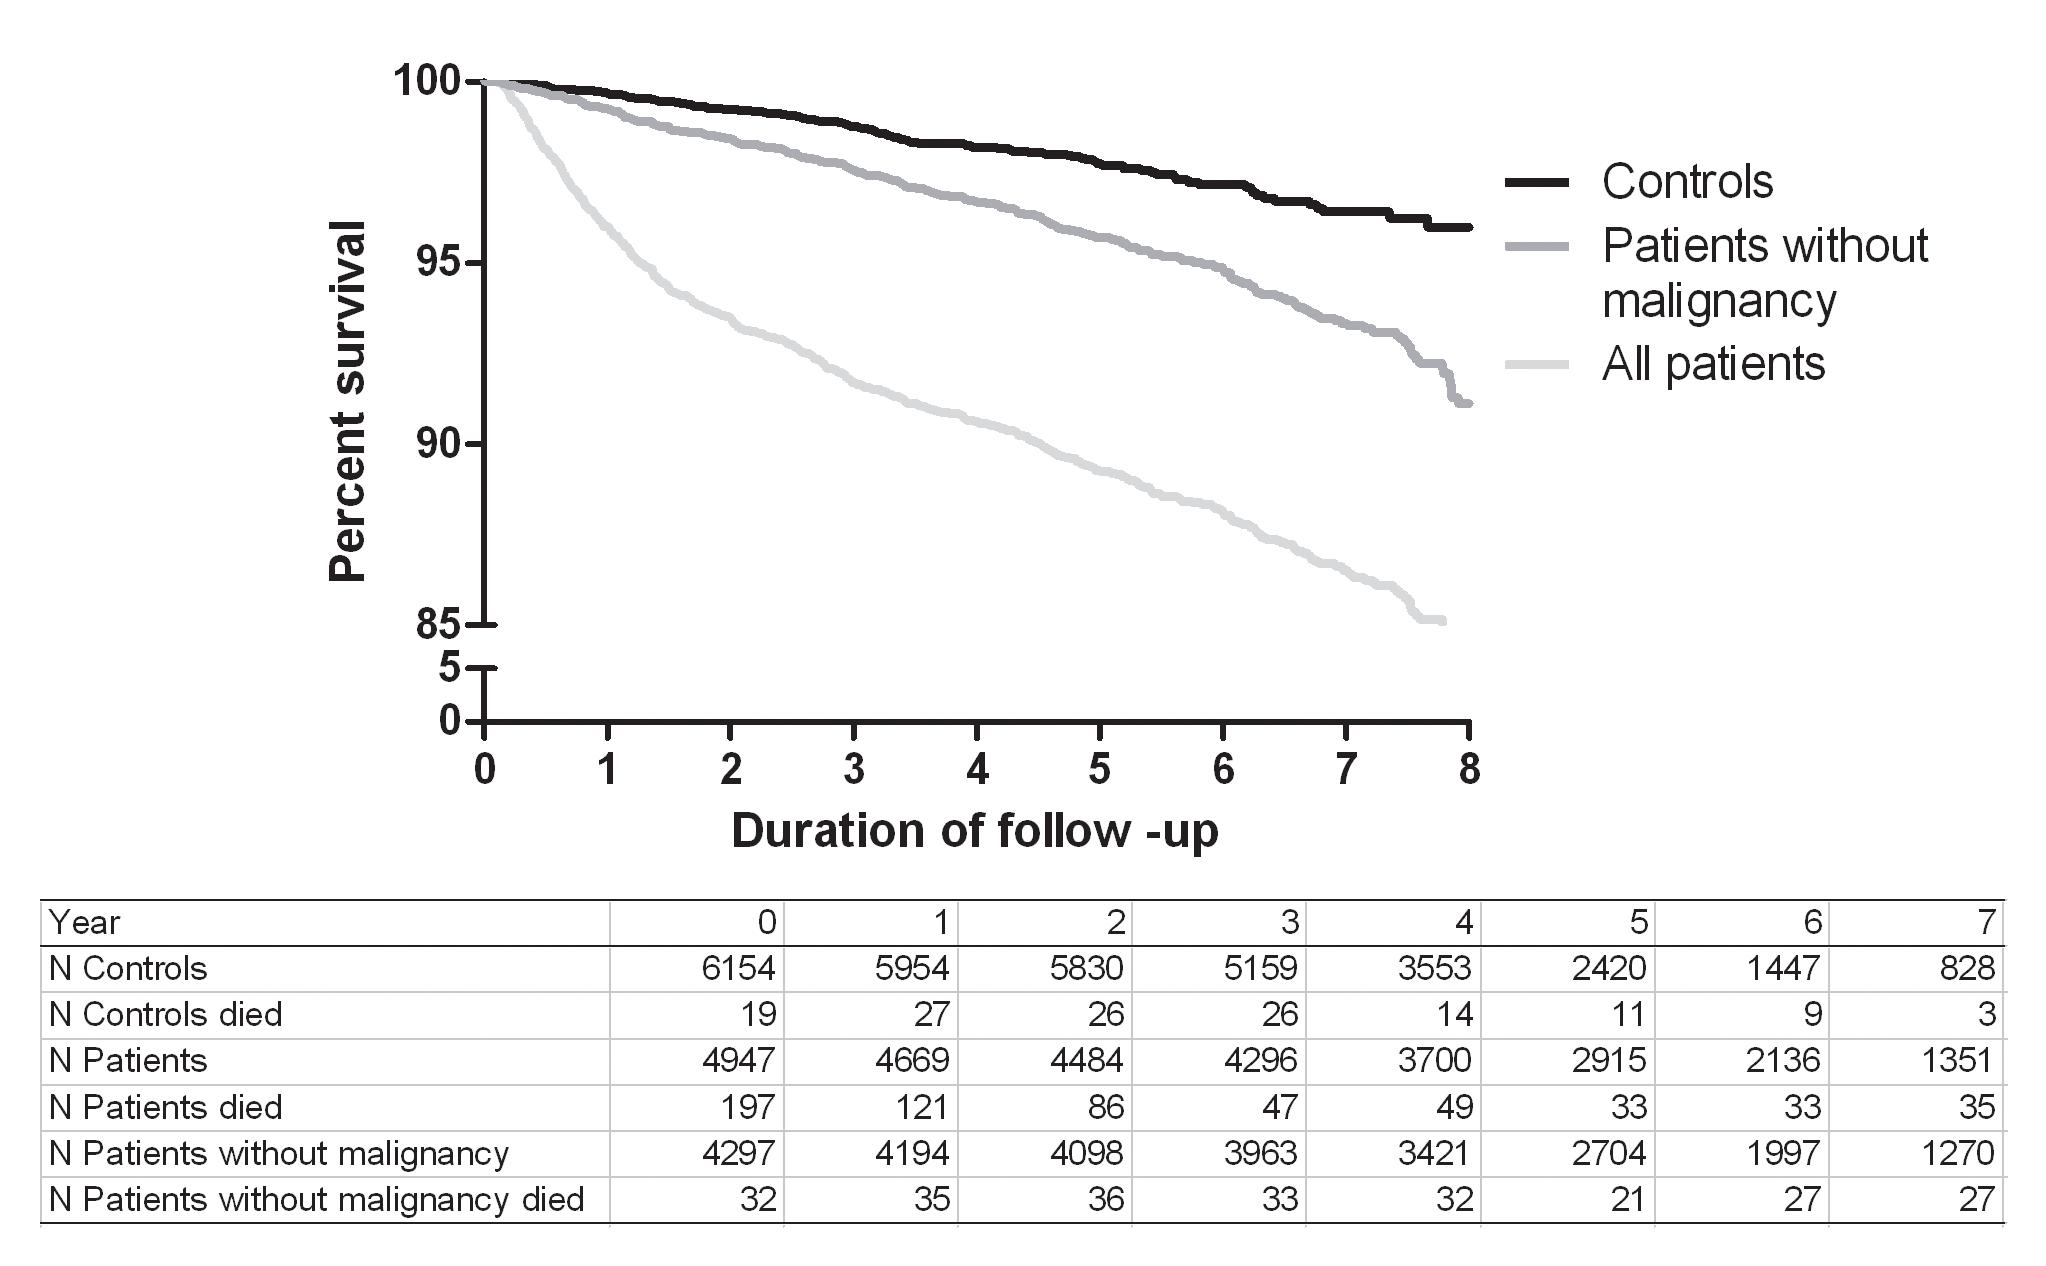 Kaplan-Meier survival curves for patients and controls.